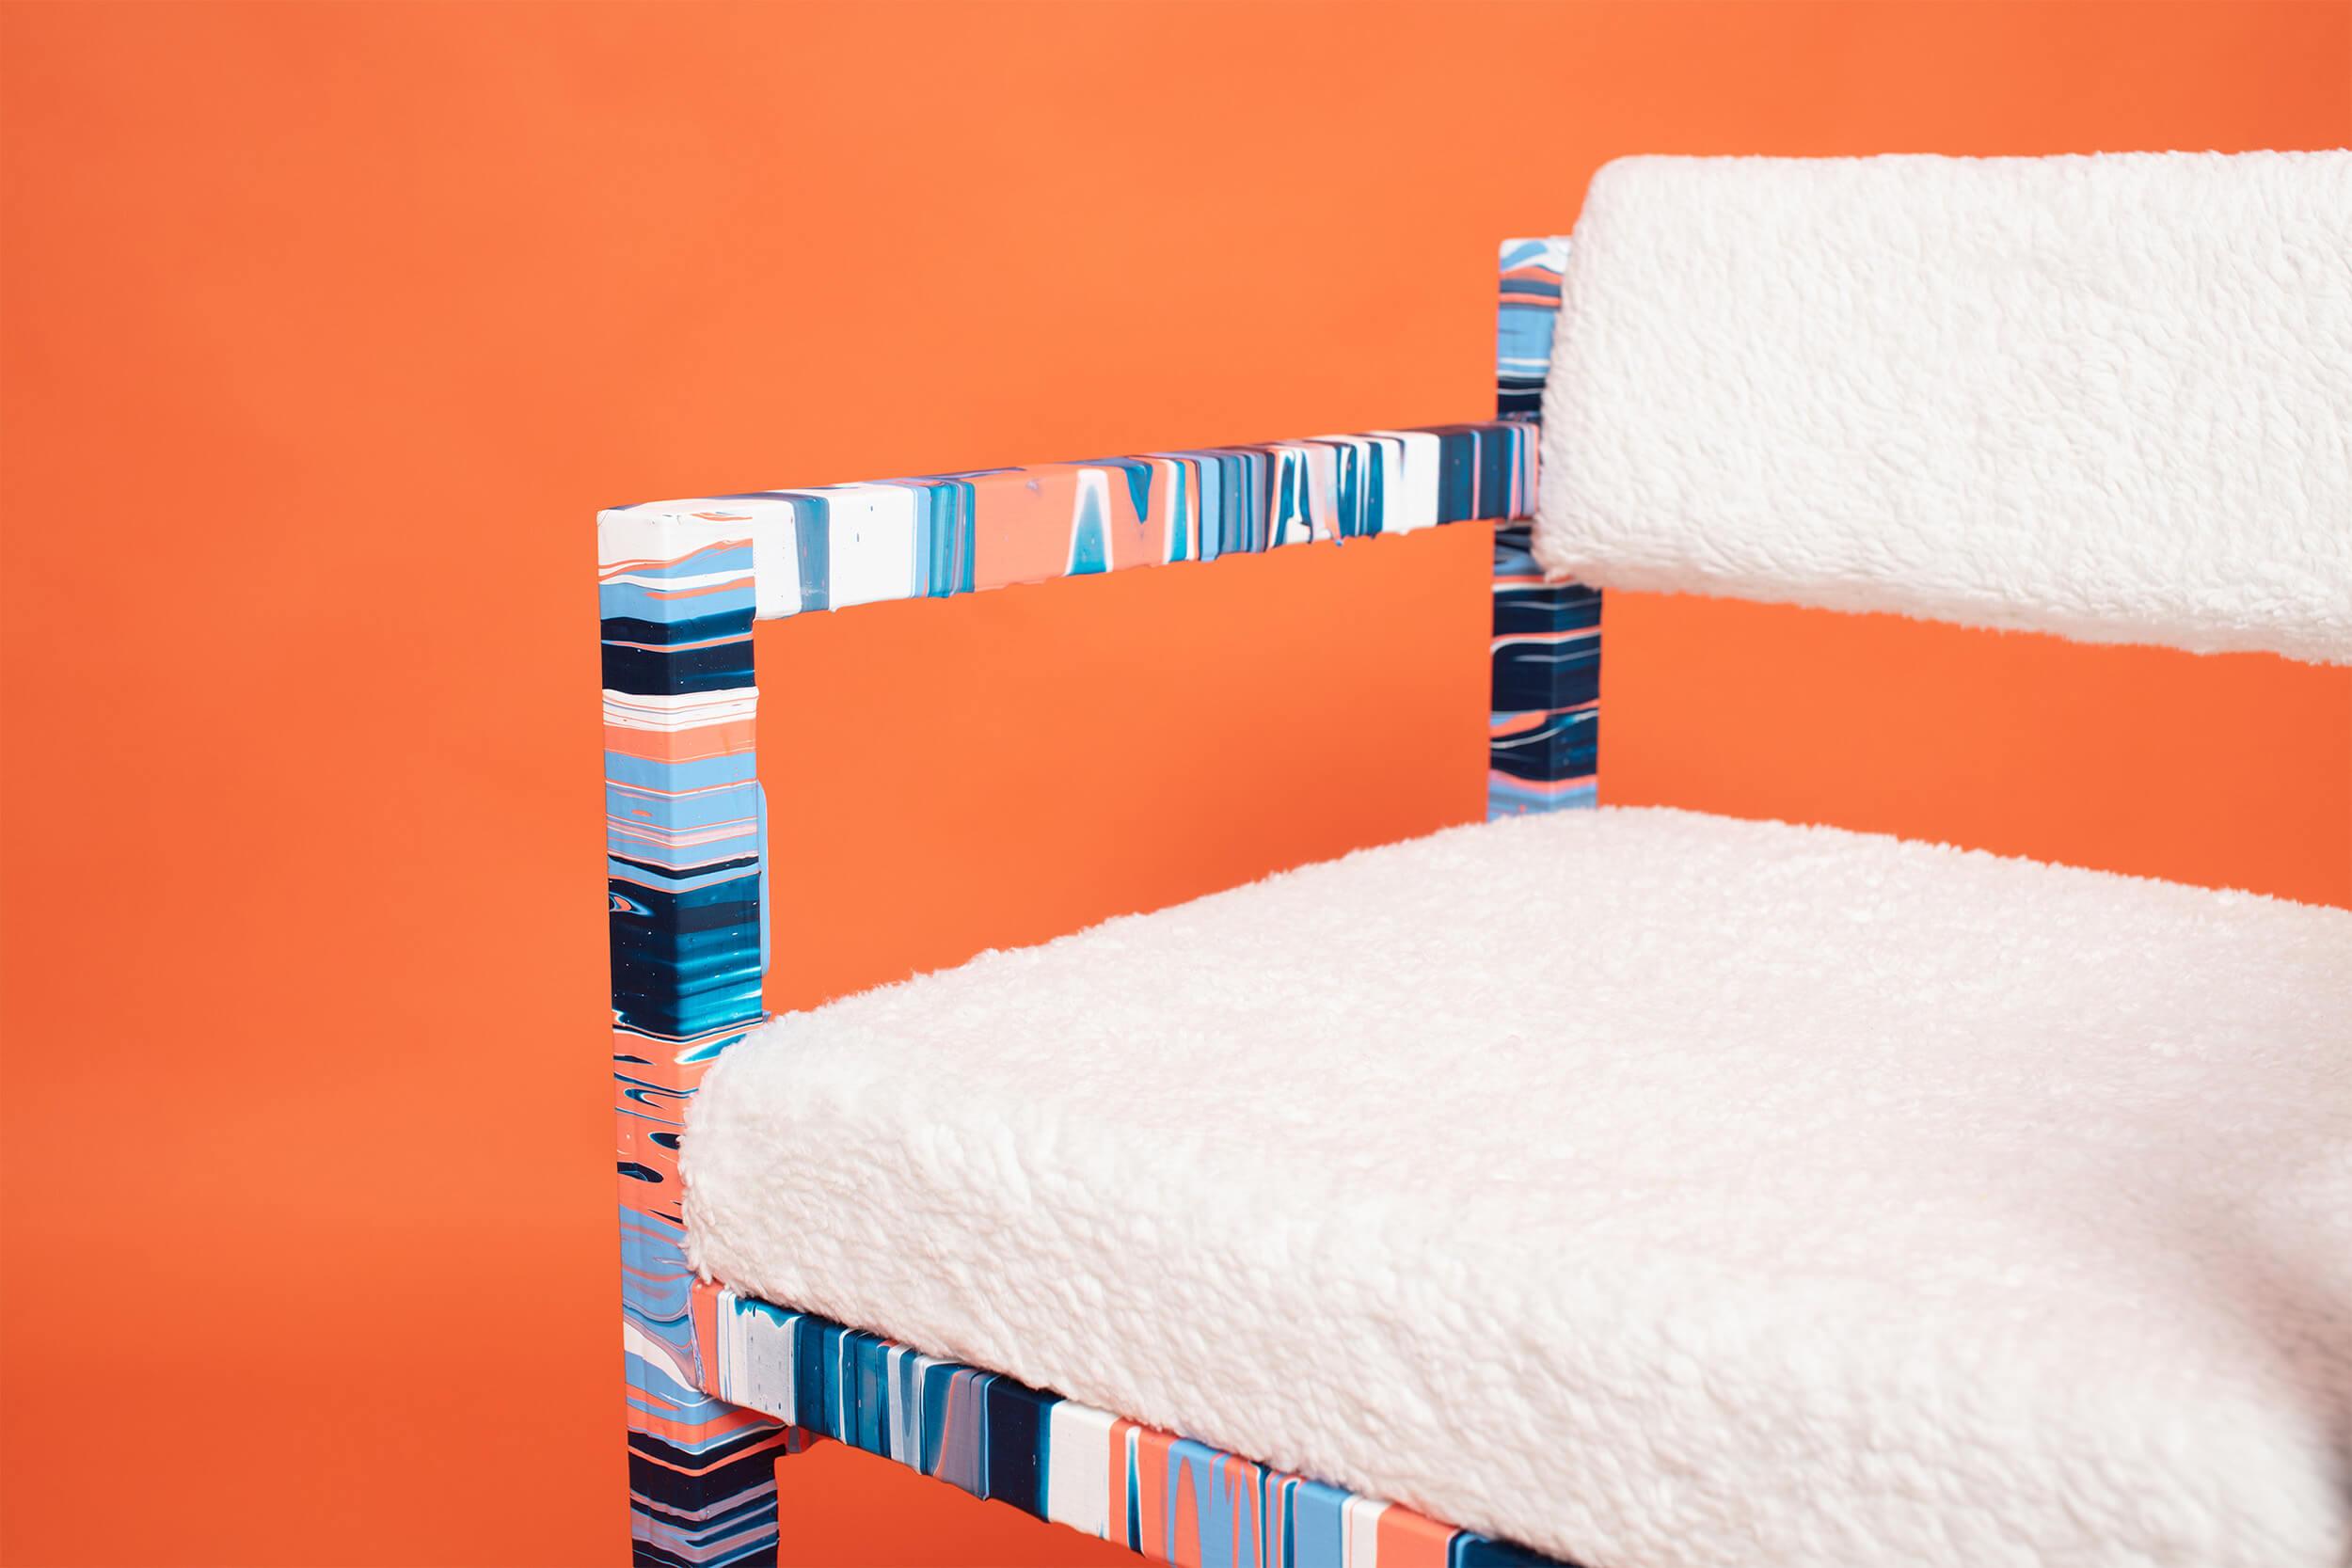 Craig Black x Dave Watson_Acrylic Fusion_JOY Chair_Typography